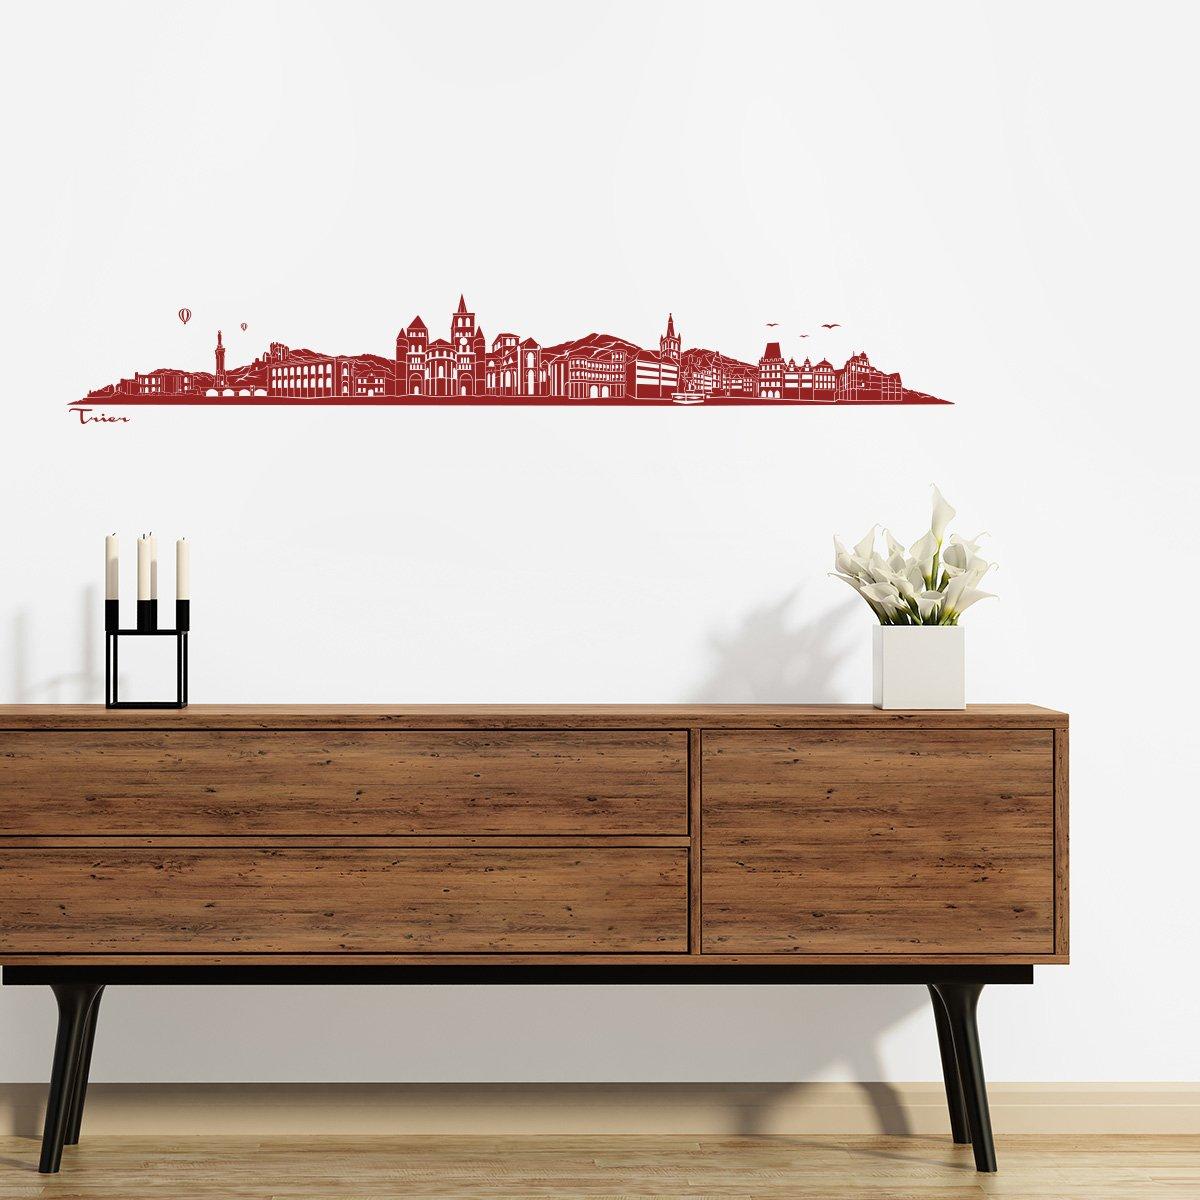 WANDKINGS Wandtattoo Wandtattoo Wandtattoo - Skyline Trier (ohne Fluss) - 240 x 36 cm - Schwarz - Wähle aus 6 Größen & 35 Farben B078SHG3WM Wandtattoos & Wandbilder 704d8e